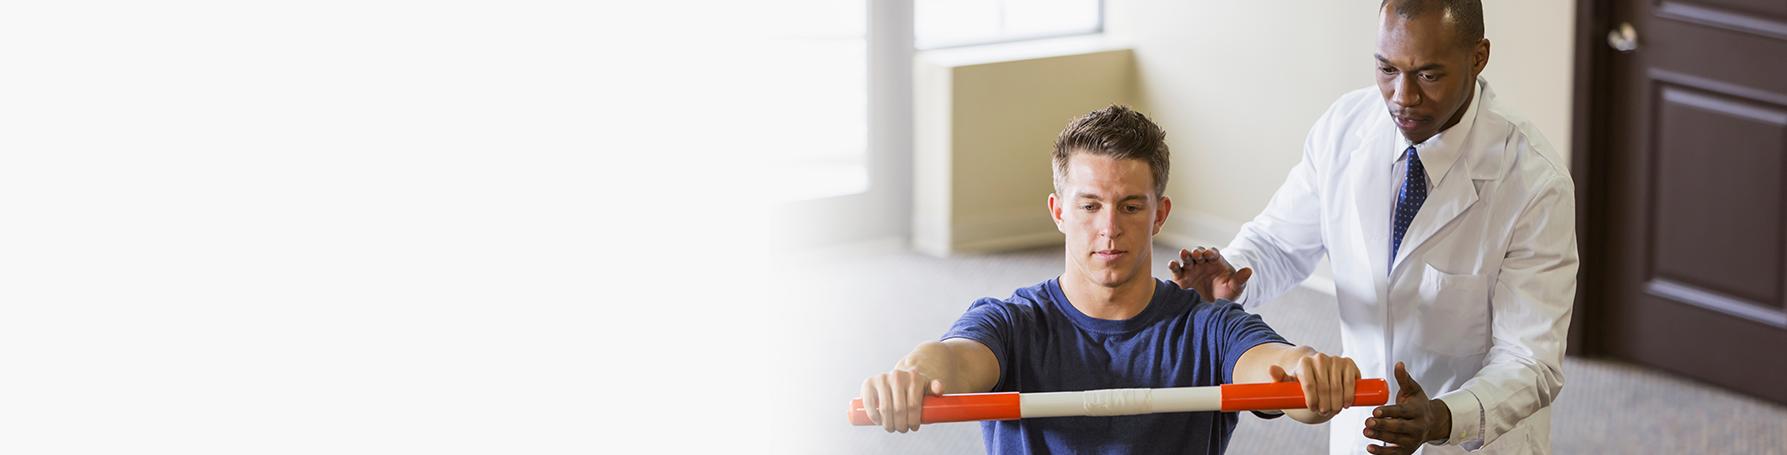 Orthopedic Sports Medicine Fellowship | Baptist Health South Florida